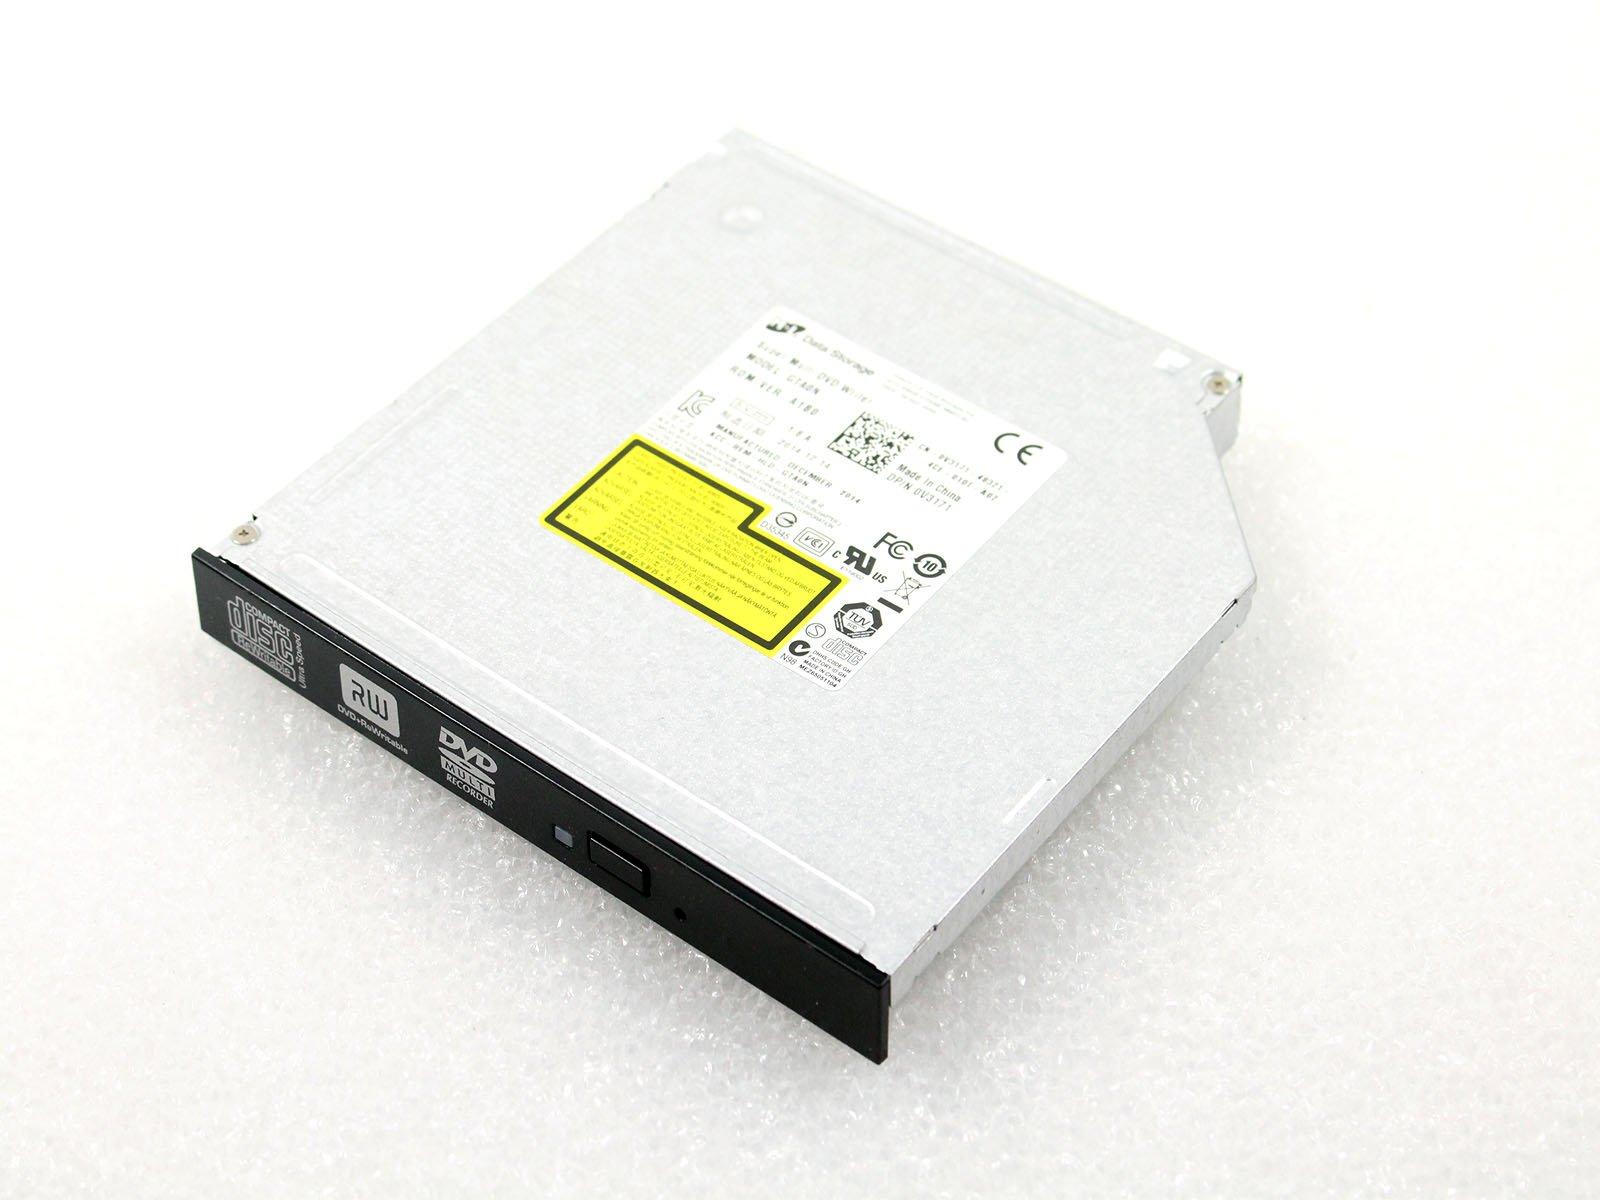 OEM Genuine Dell Inspiron One 2020 Dvd +/- Rw Drive GTA0N V3171